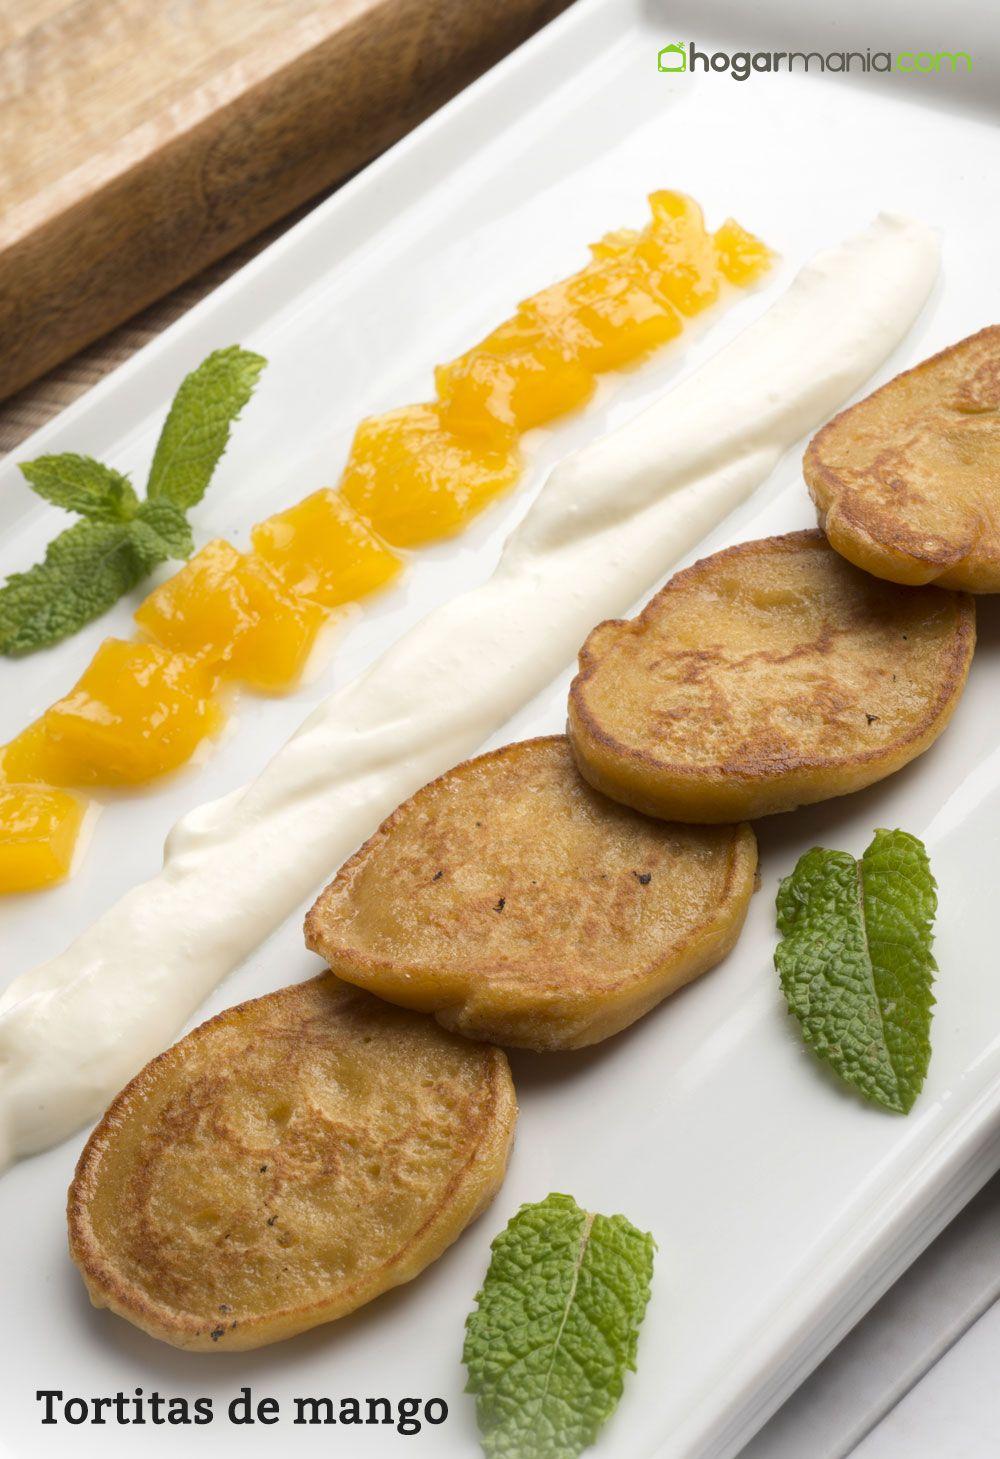 Tortitas de mango